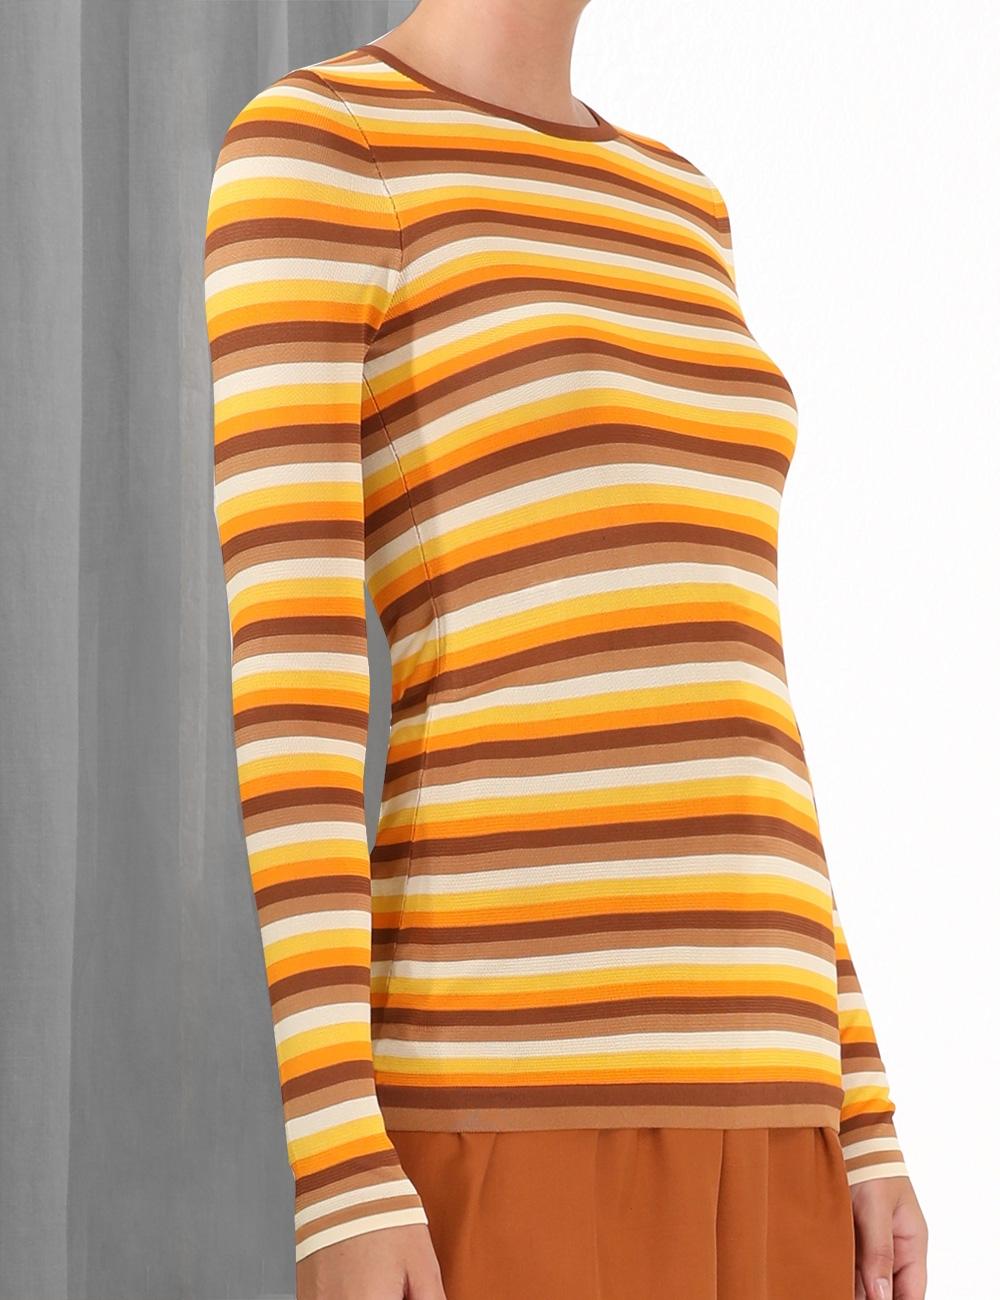 Zippy Long Sleeve Top